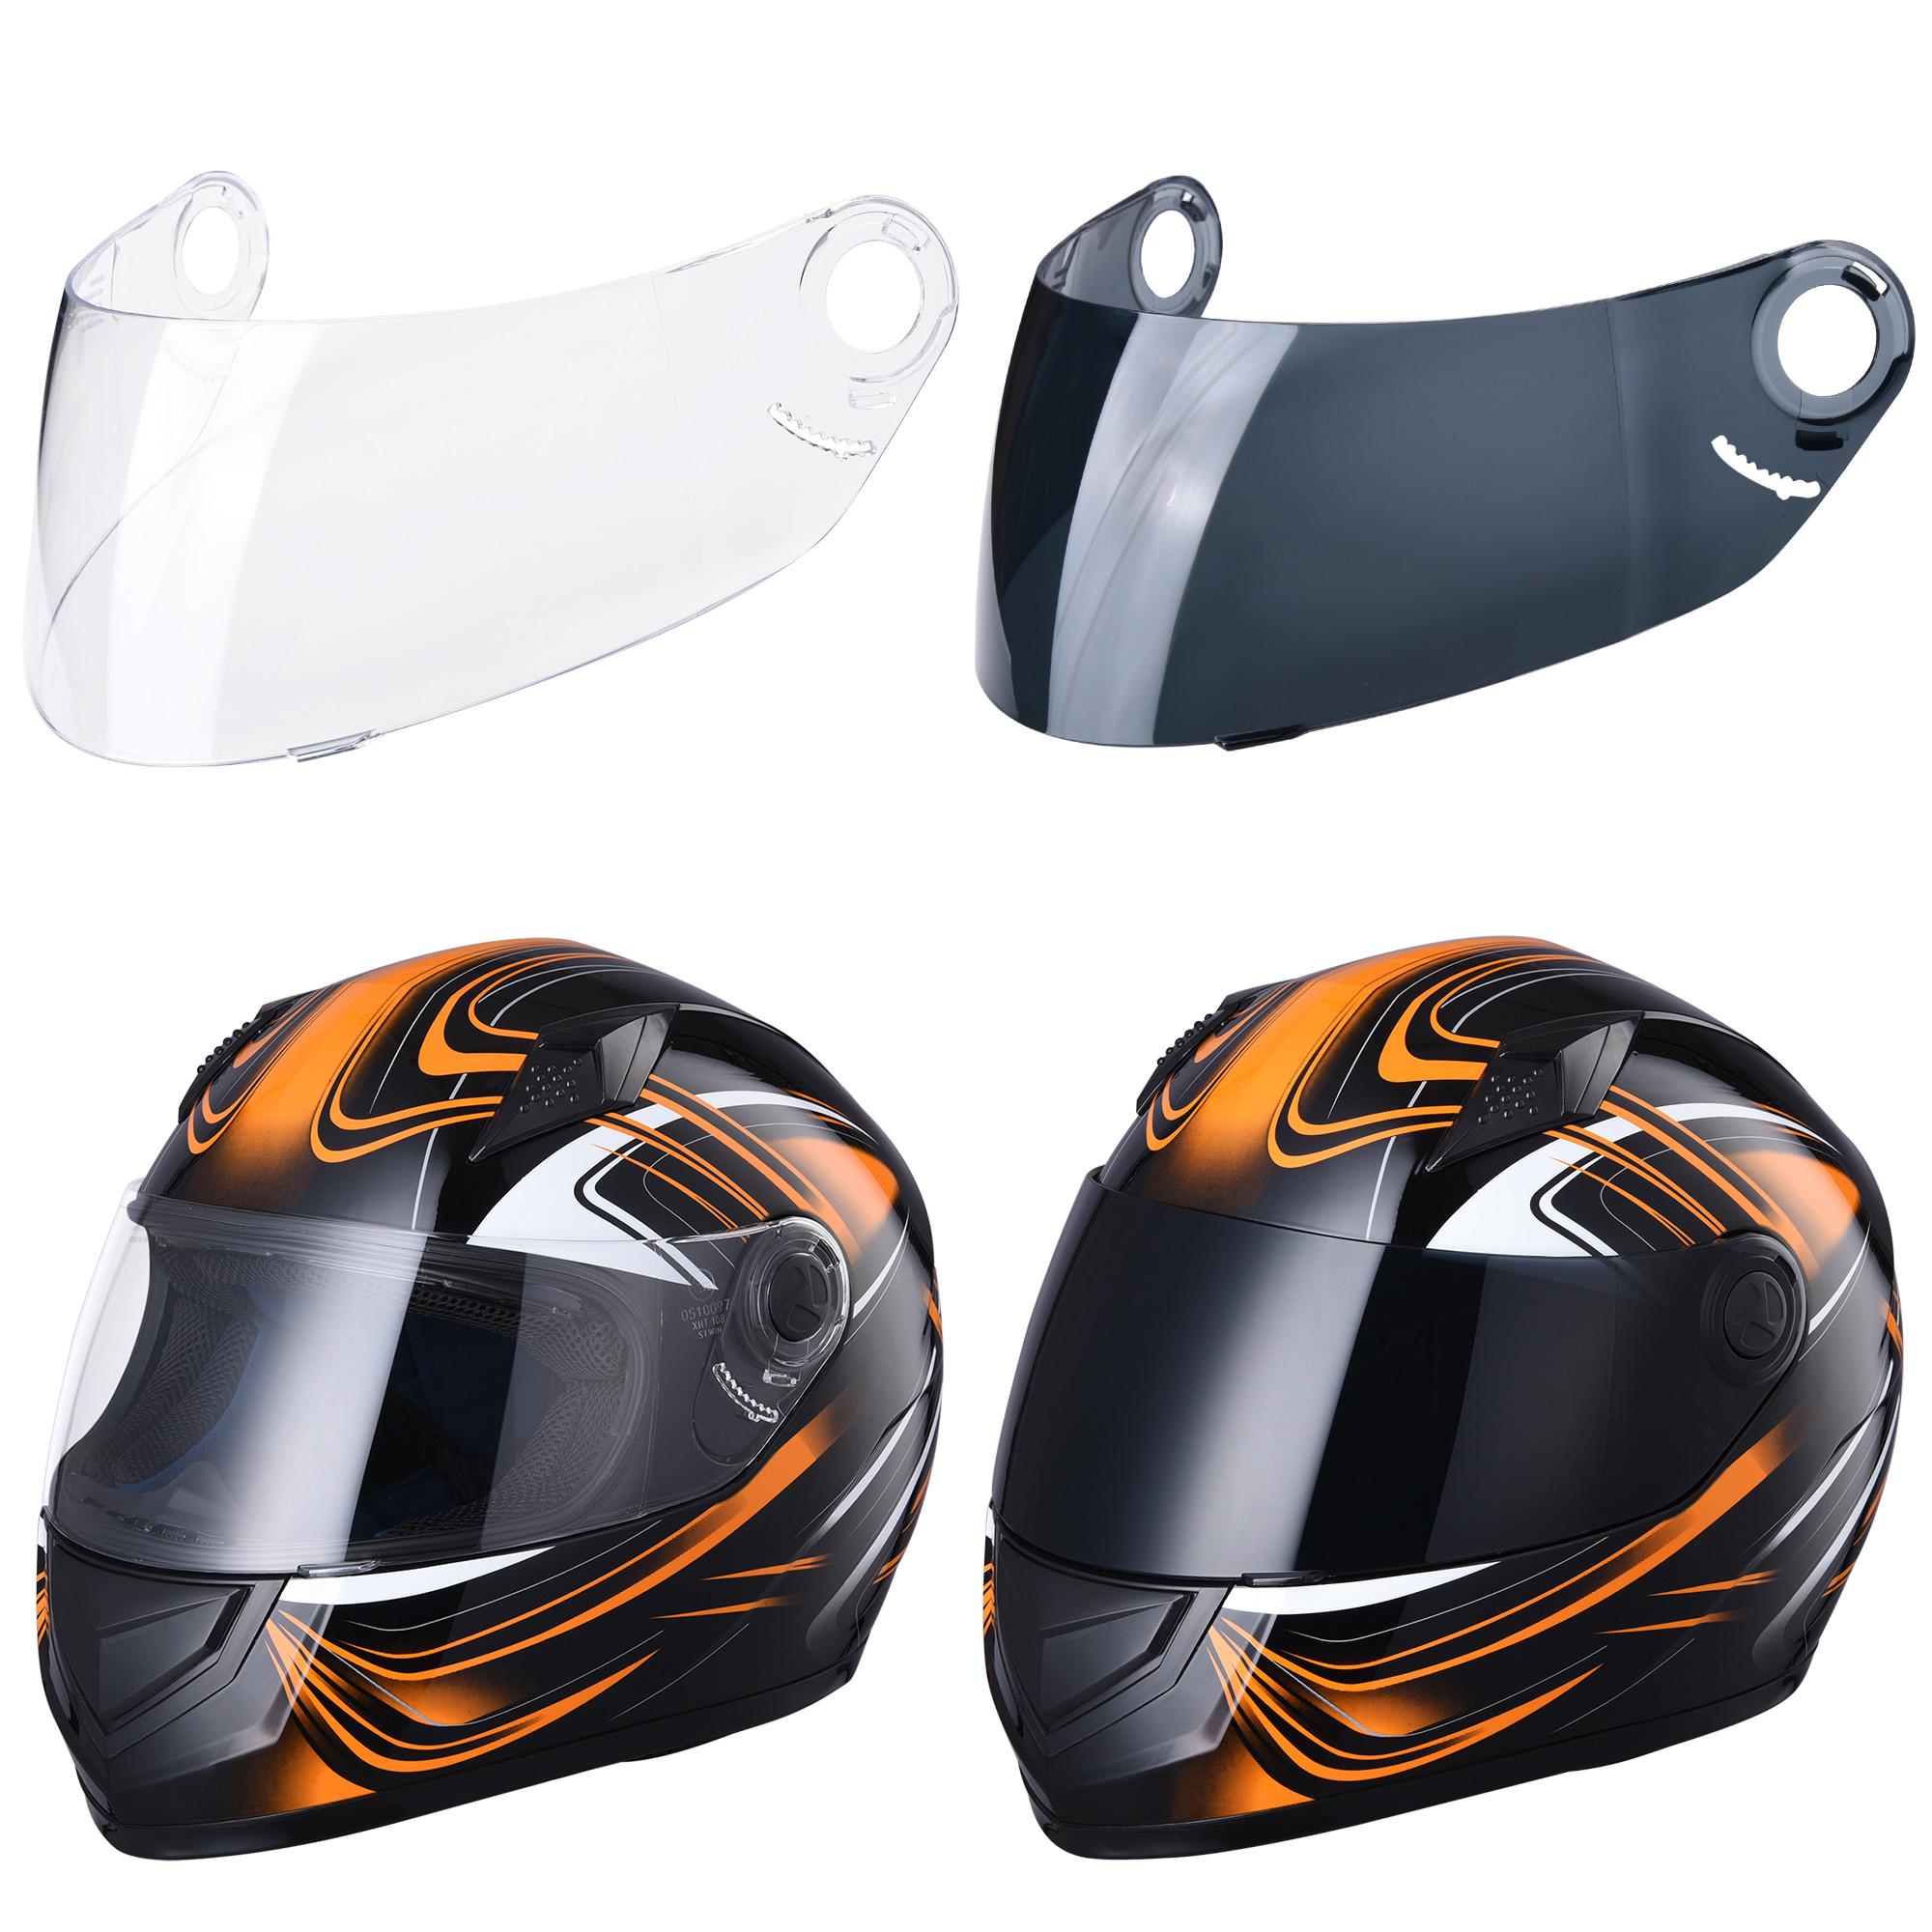 miniature 149 - AHR K12 Full Face Motorcycle Helmet DOT Air Vents Clear Visor Racing S M L XL